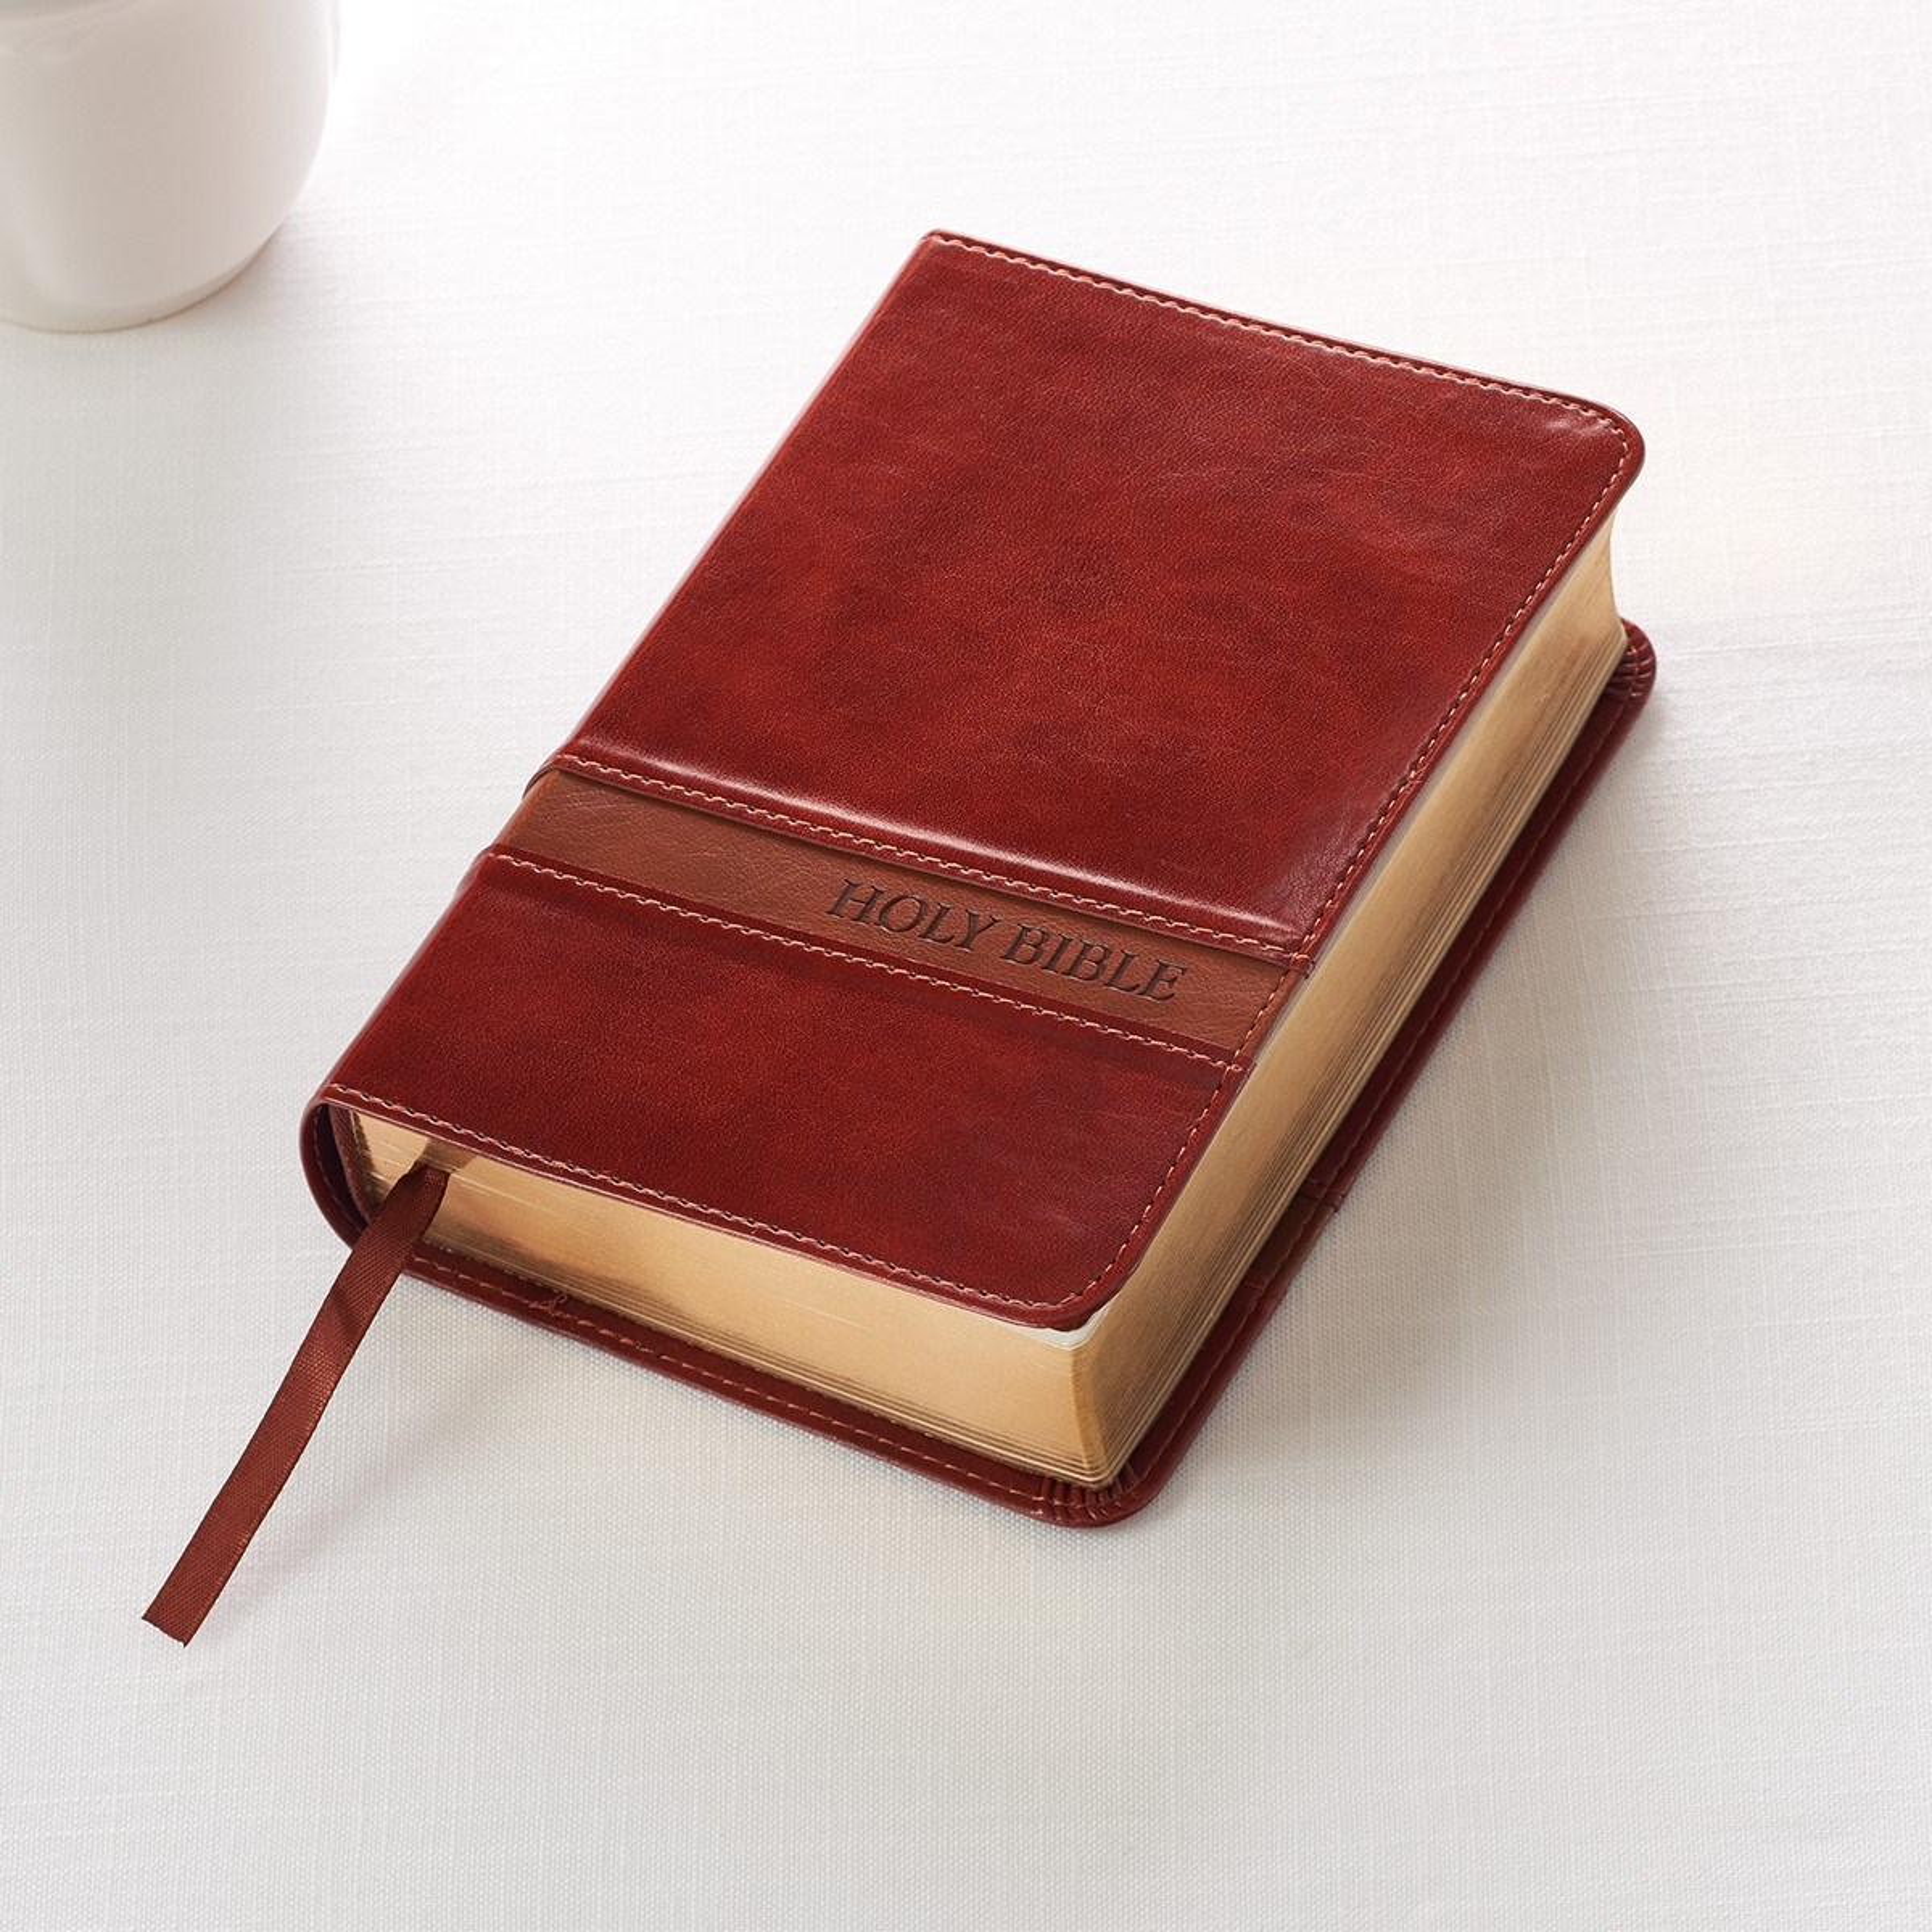 KJV Compact/Large Print Bible-Brown LuxLeather